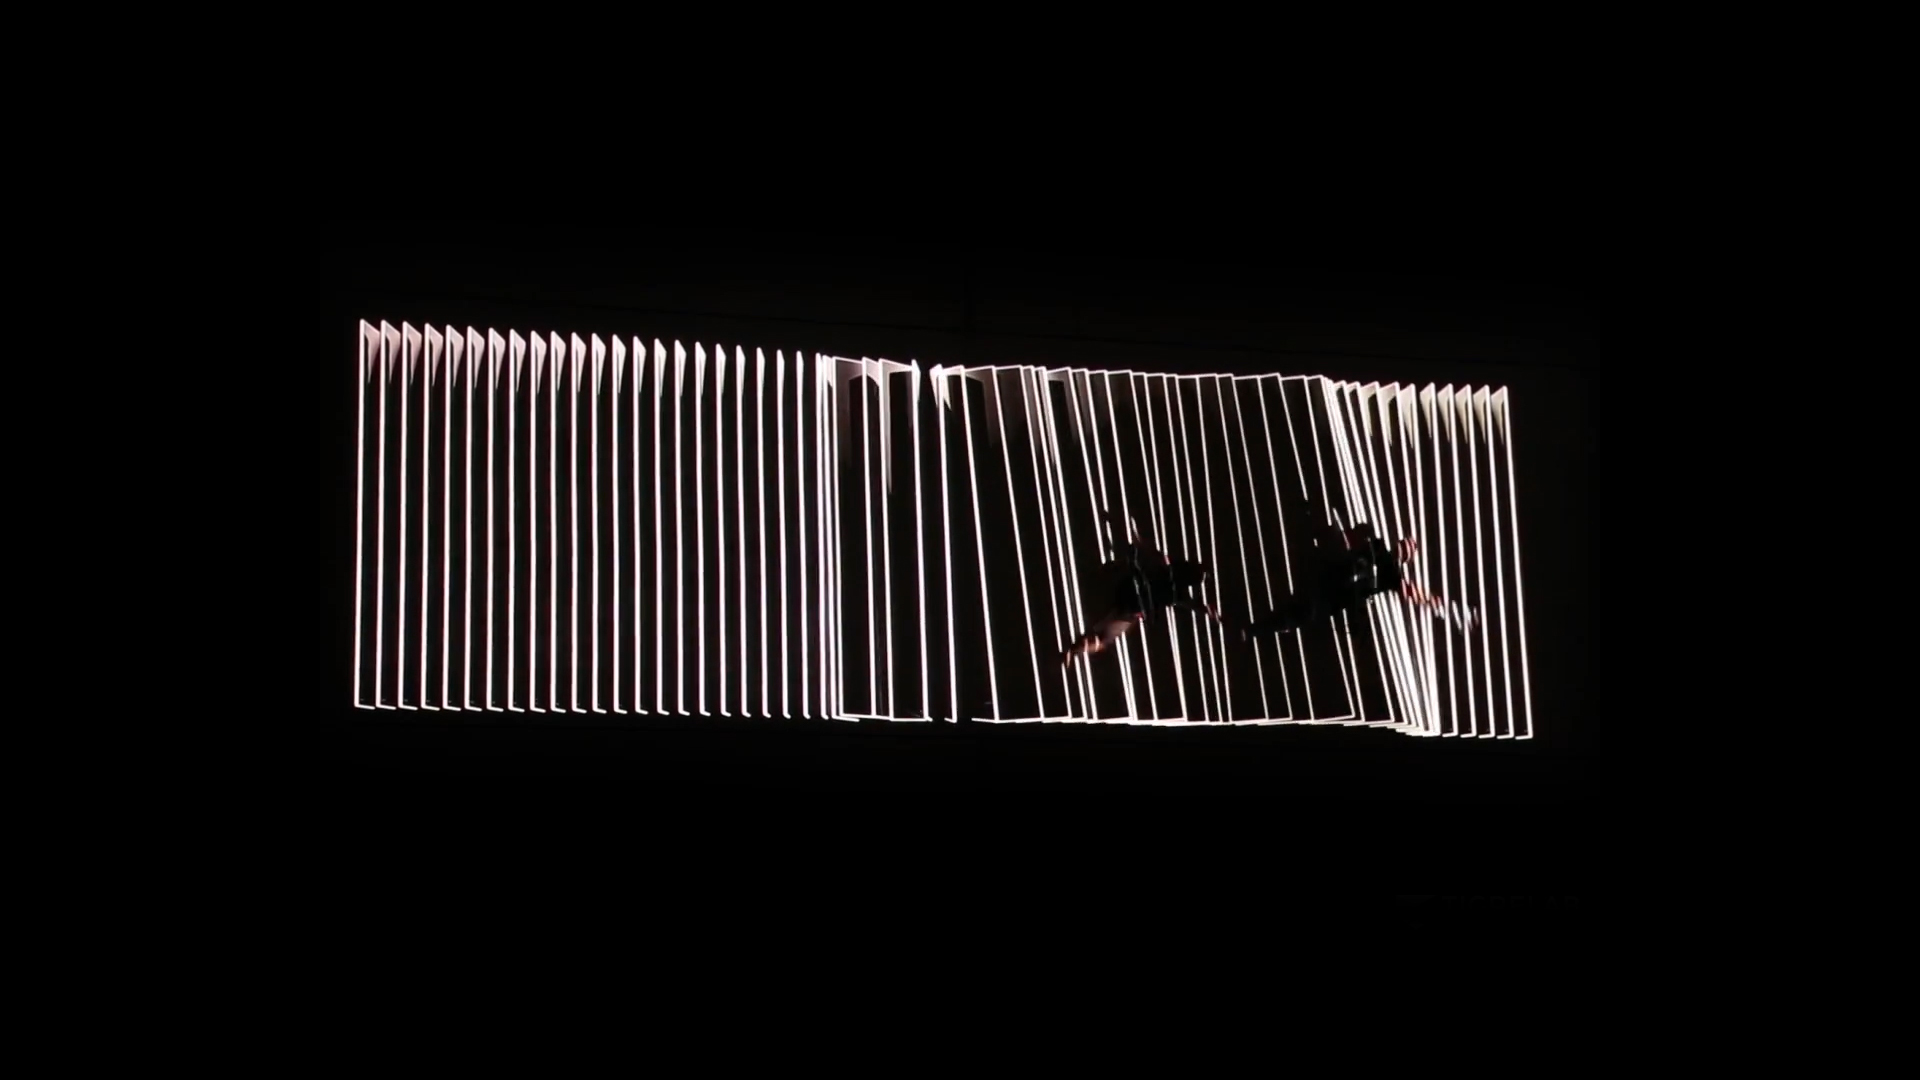 vertical dance projection marató